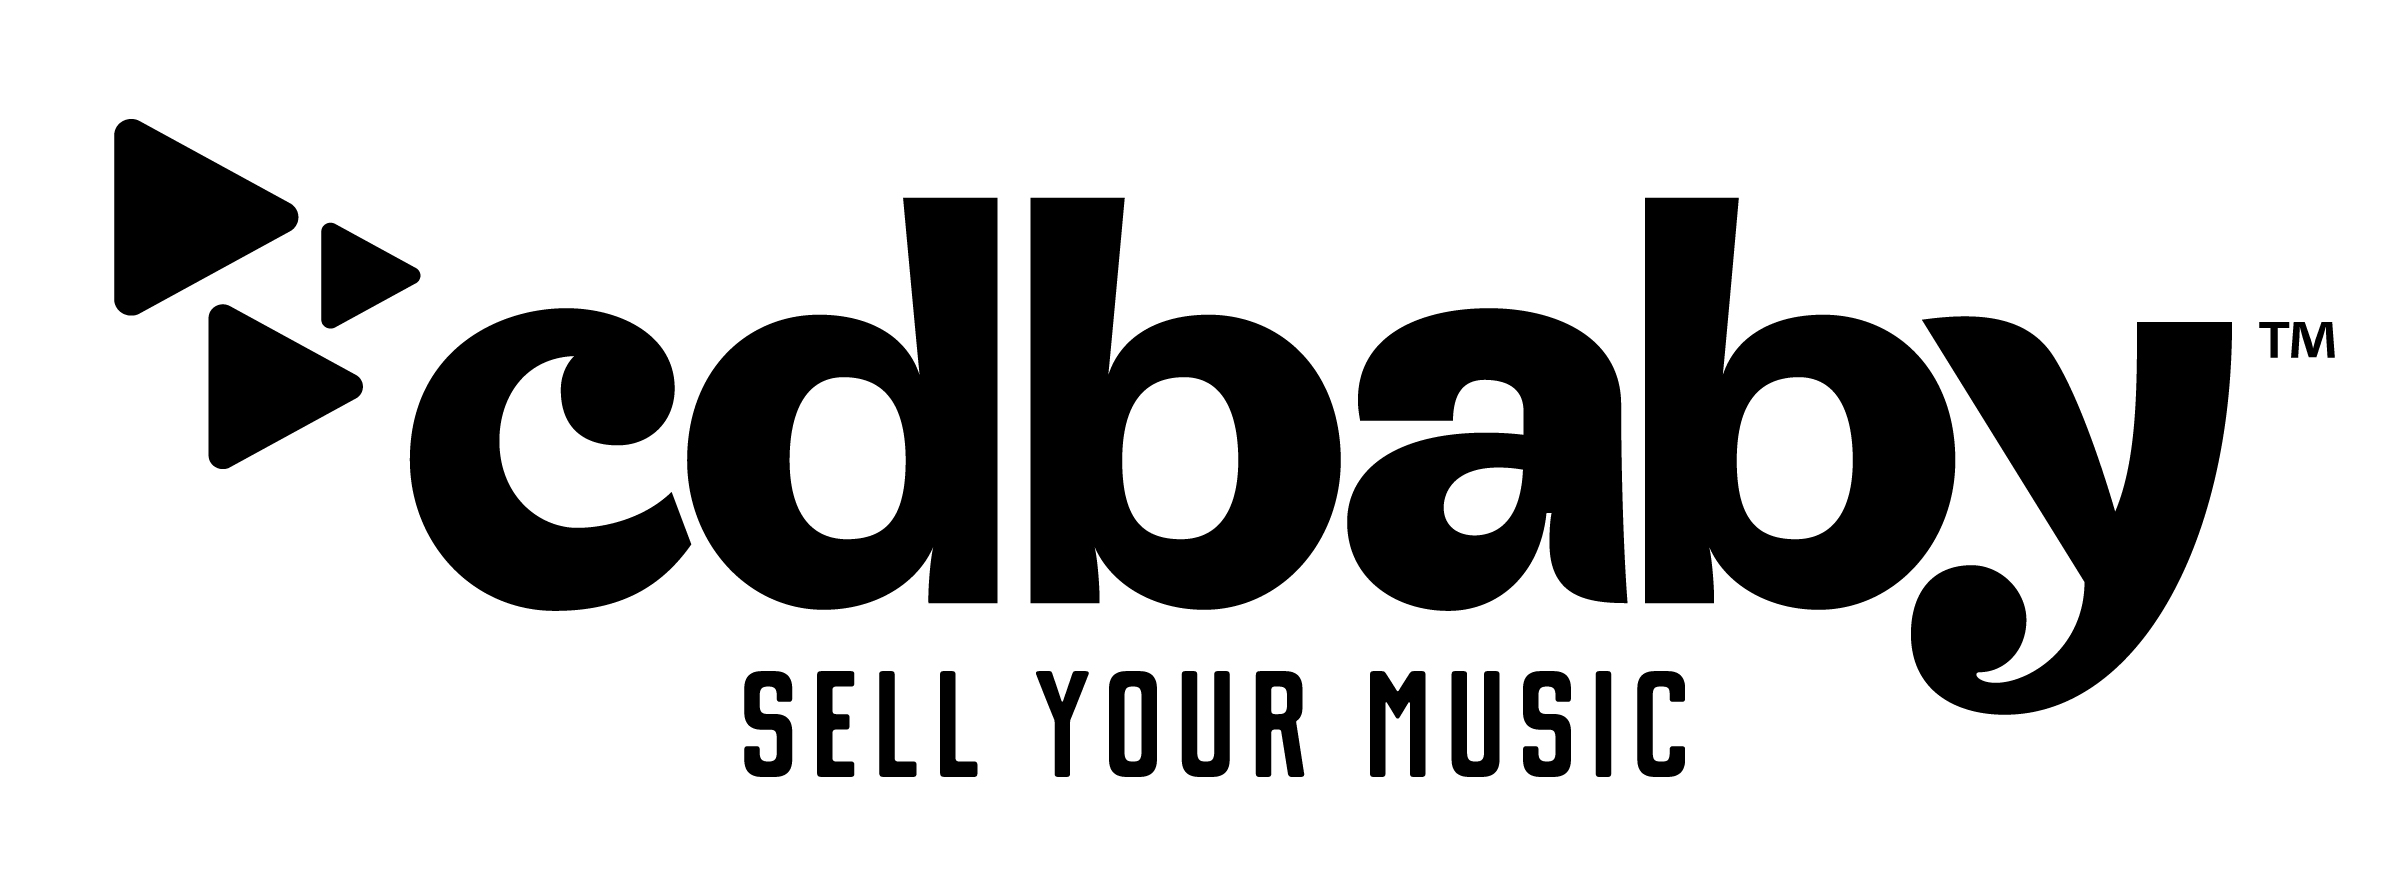 CDBABY_Logo_black_8x8-01